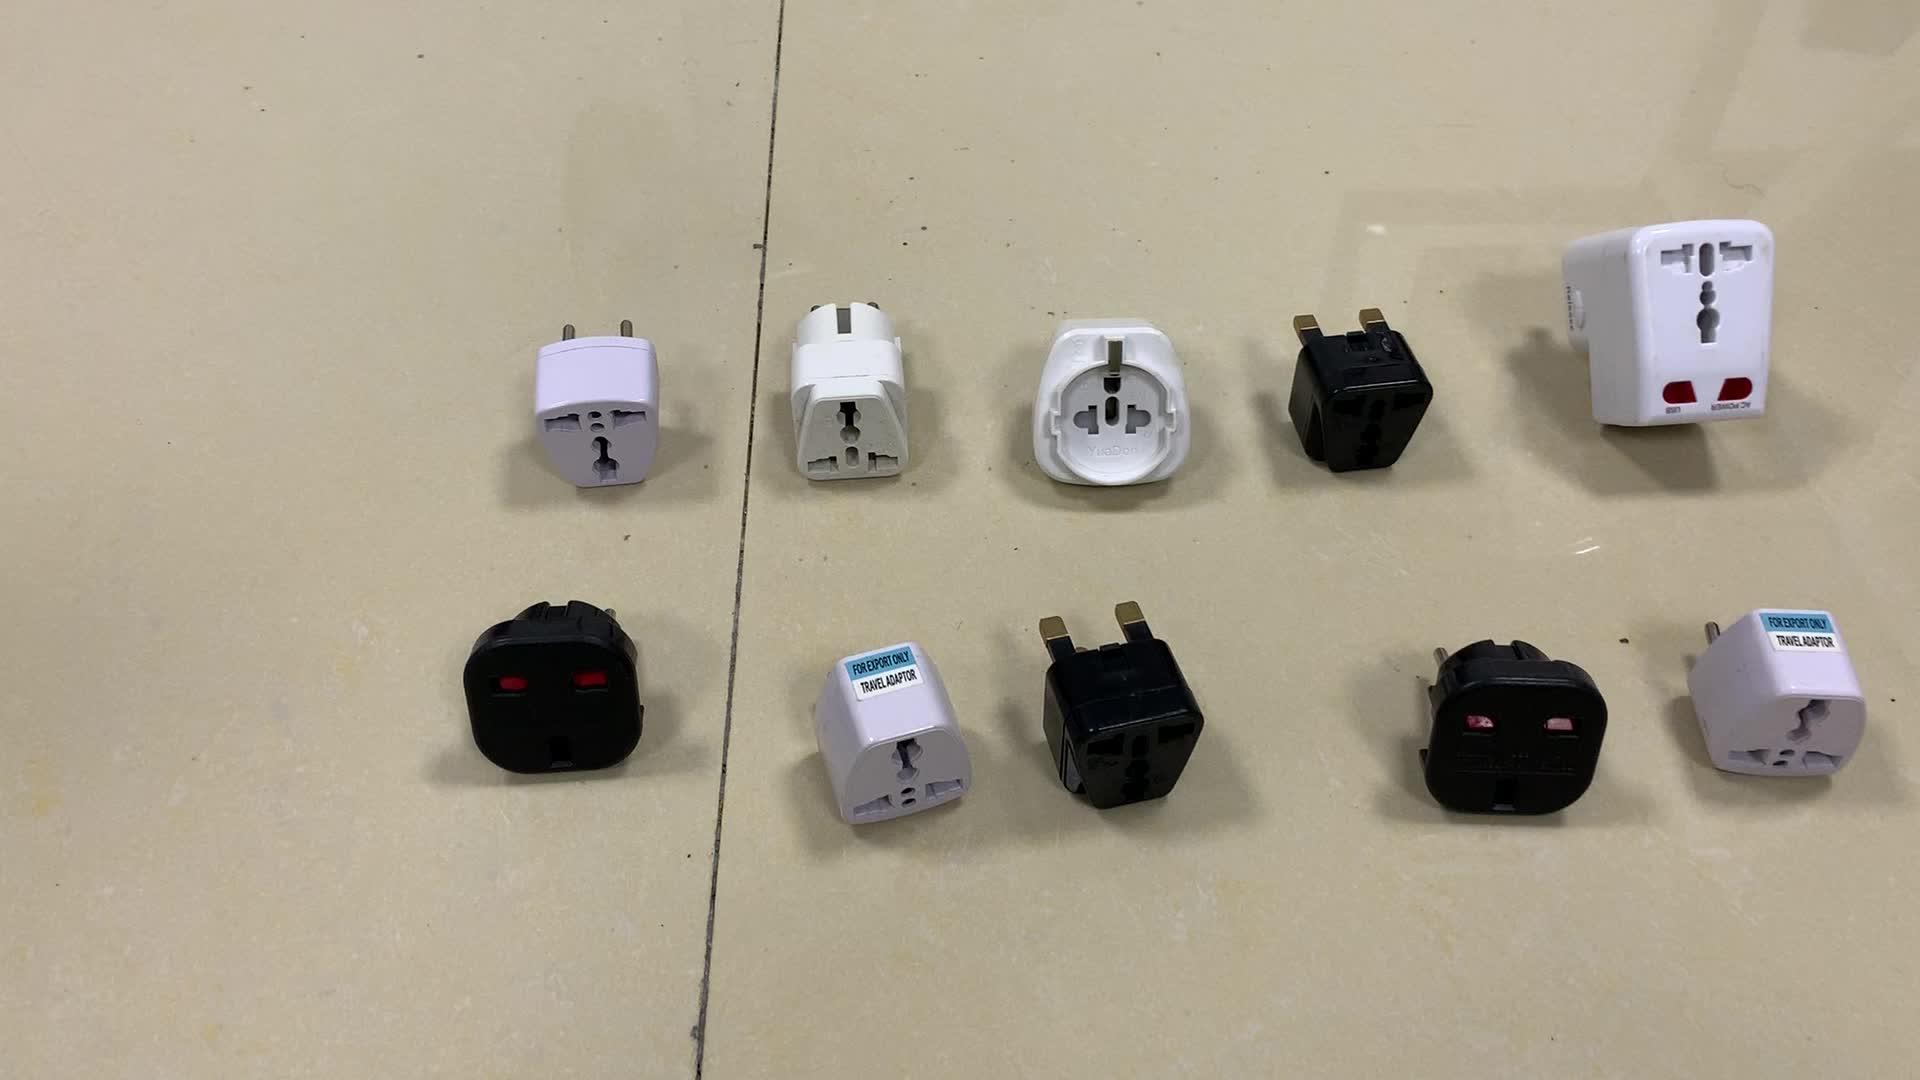 Renkli Seyahat adaptörü, USB ile Çok amaçlı seyahat elektrik adaptörleri, usb adaptörü